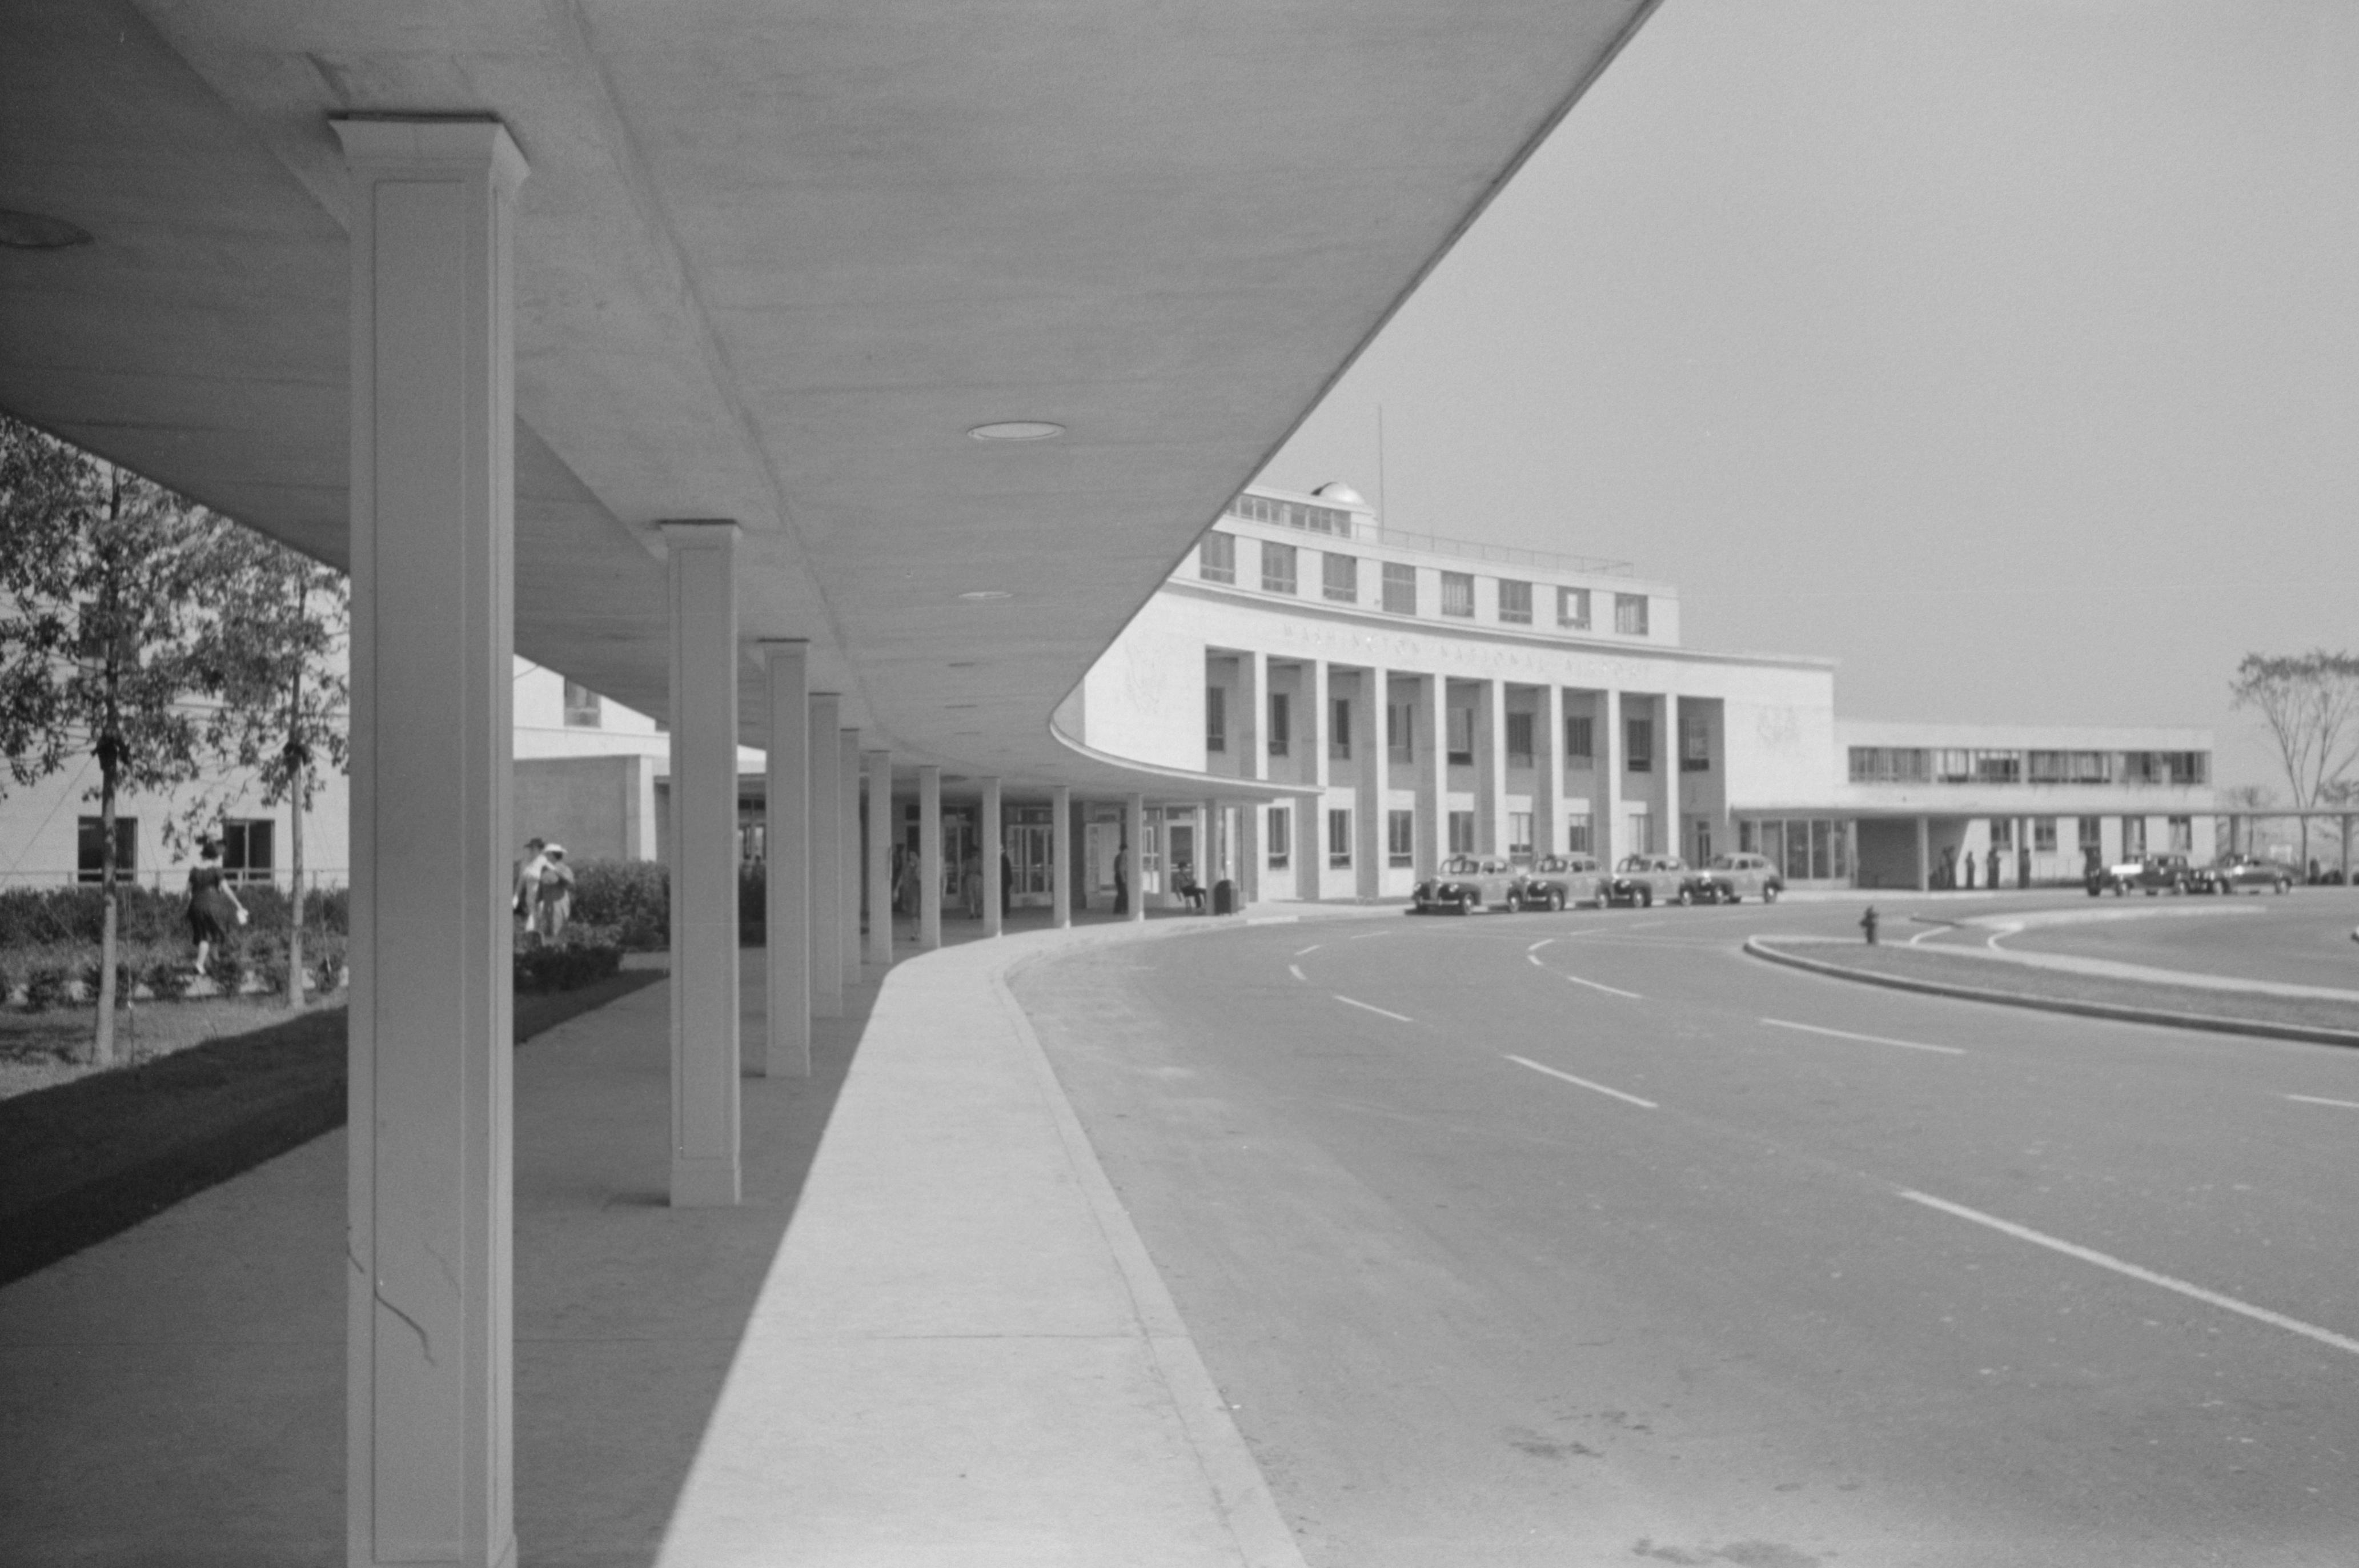 File:Washington National Airport 1941 LOC fsa.8a36232.jpg